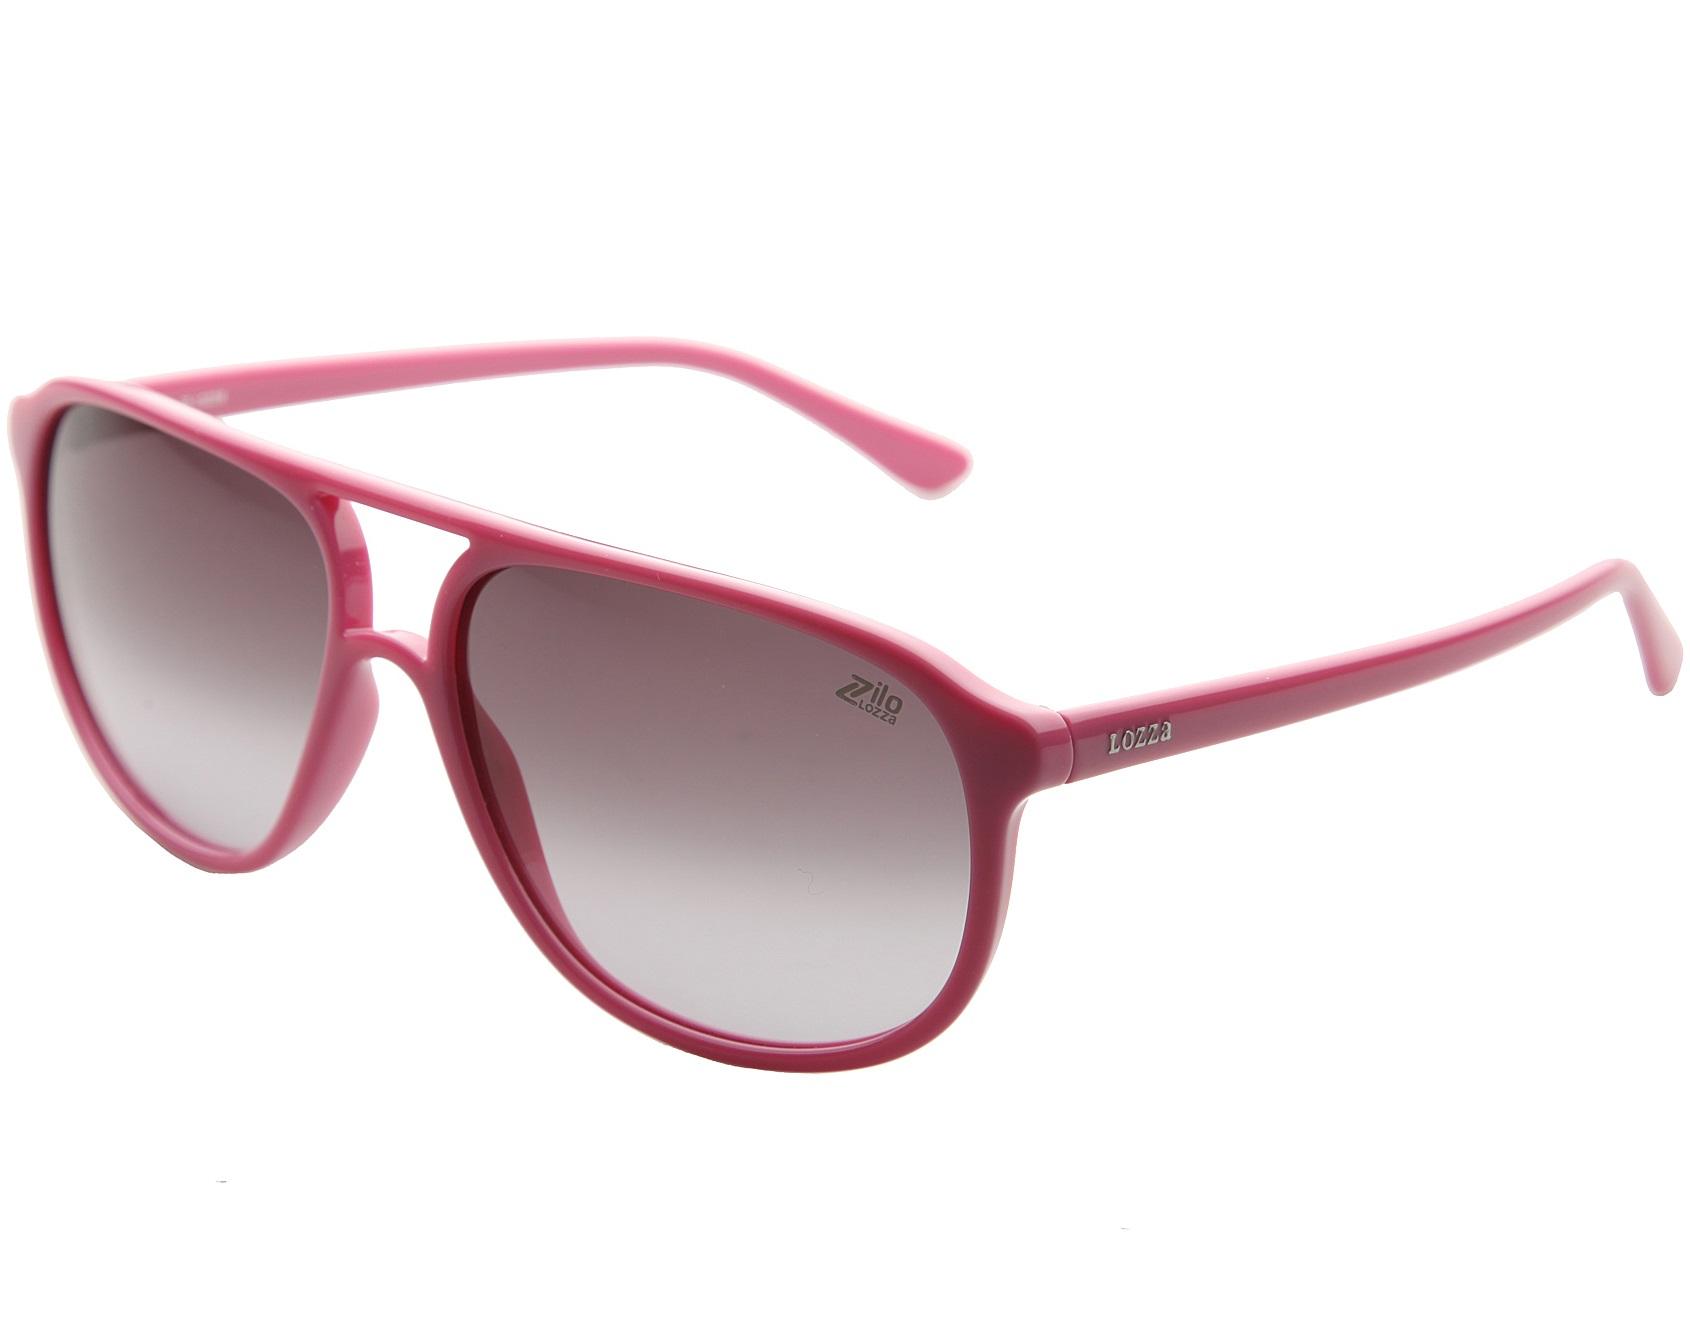 Sunglasses Lozza SL1872 5806C2 Rf600290